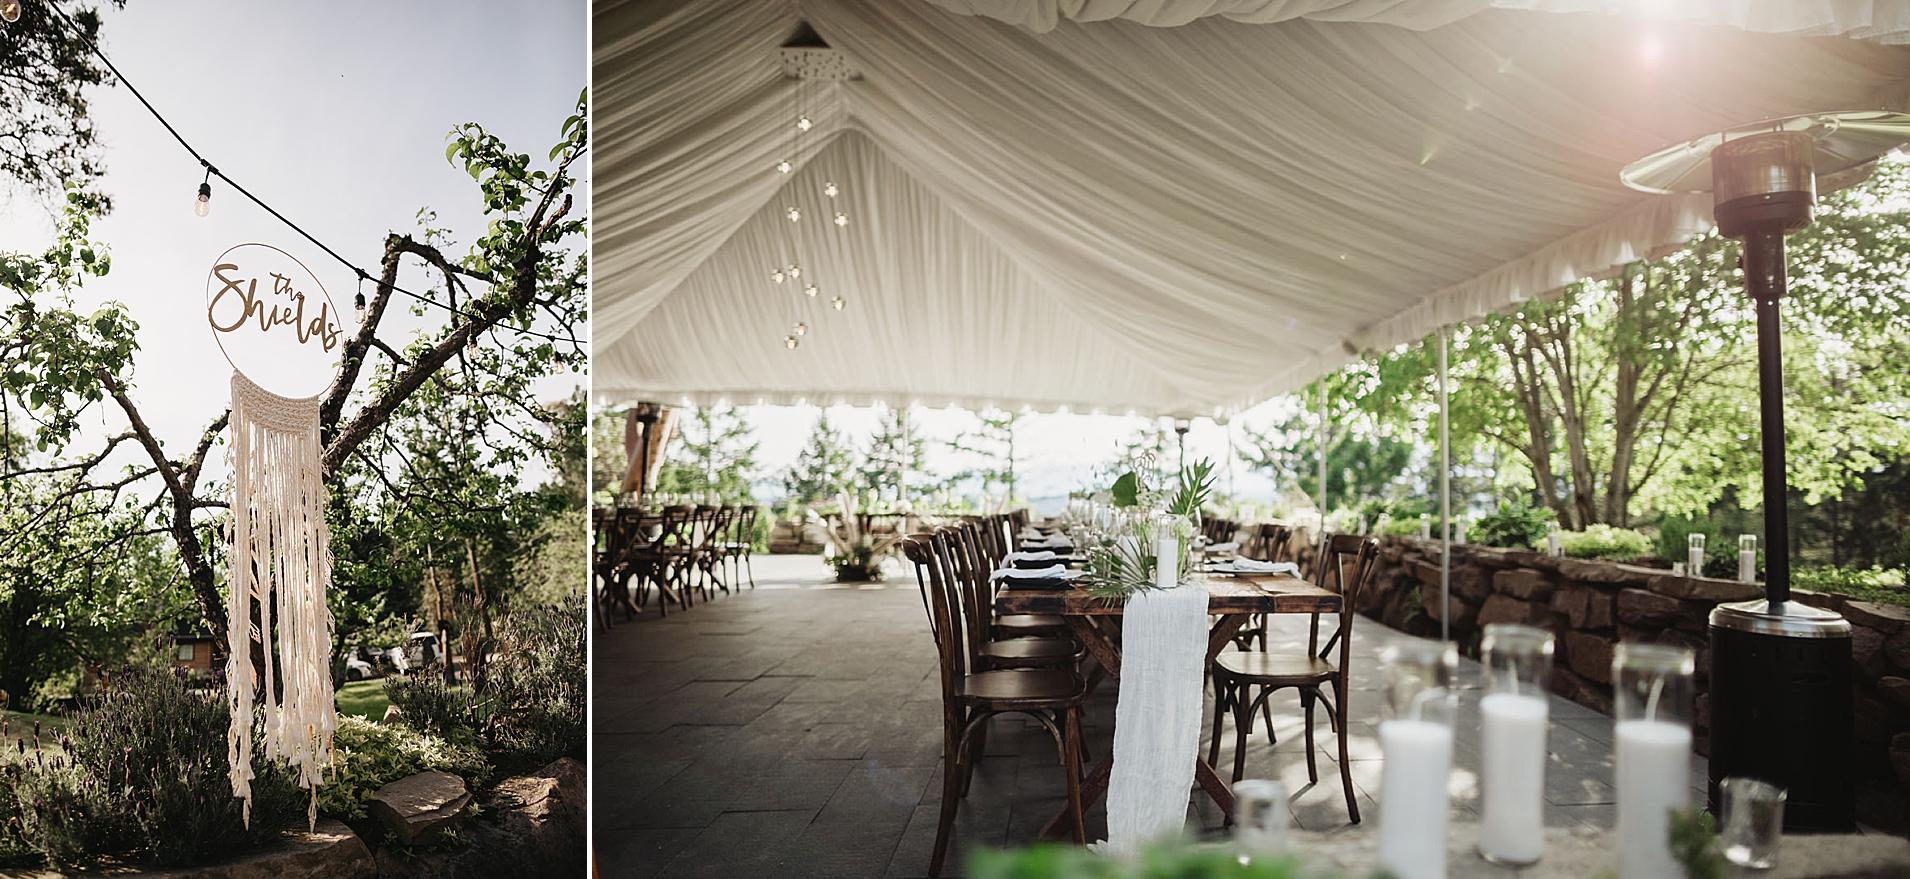 bodega ridge reception tent.jpg